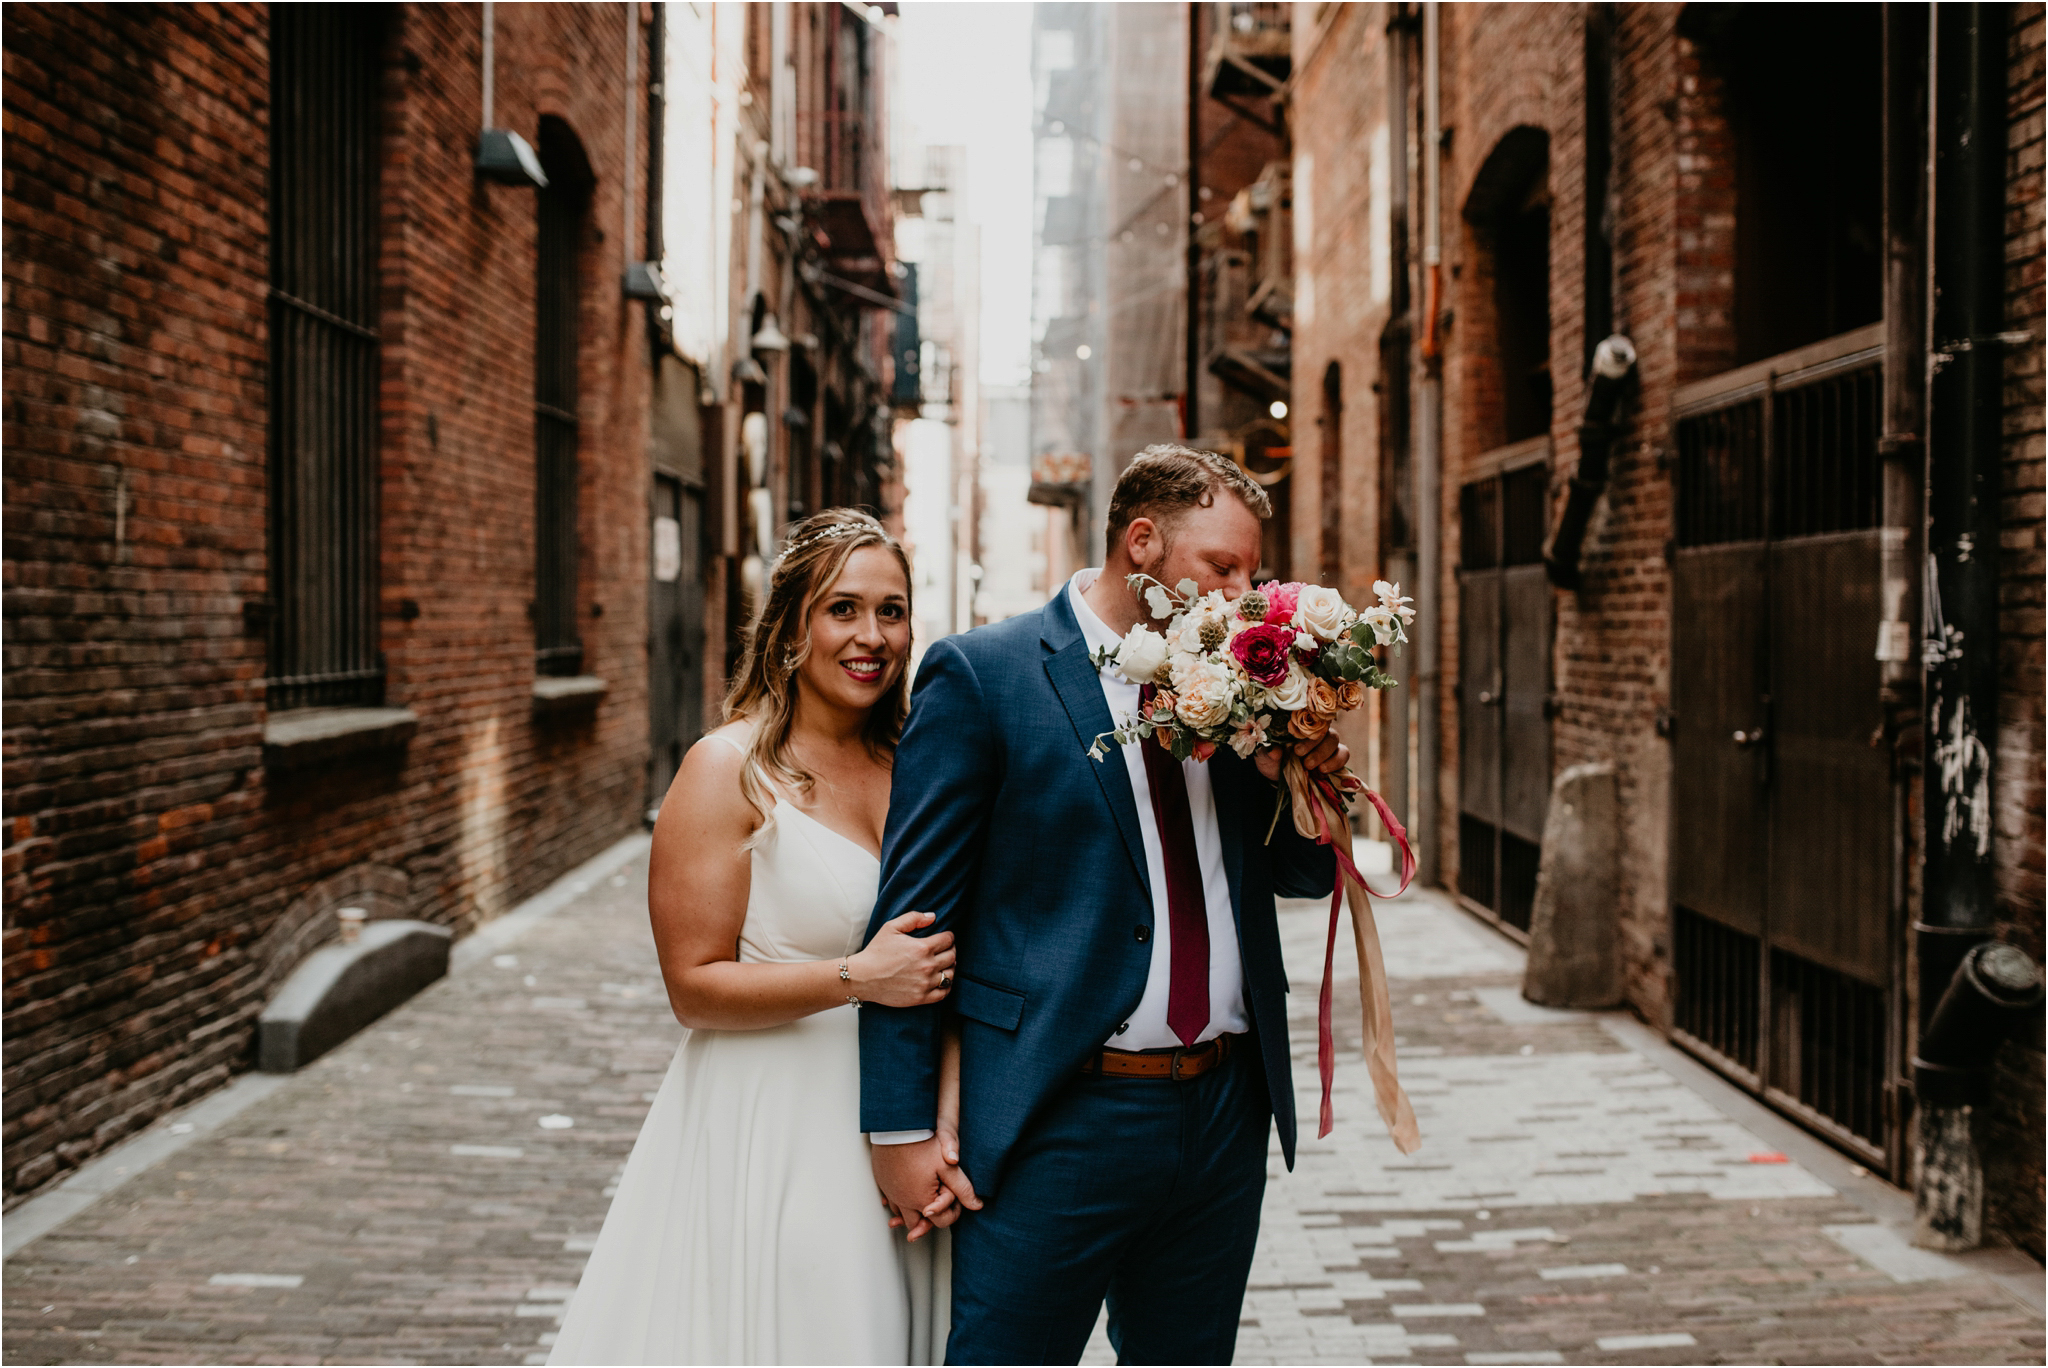 laura-and-matt-metropolist-urban-seattle-wedding-photographer-070.jpg